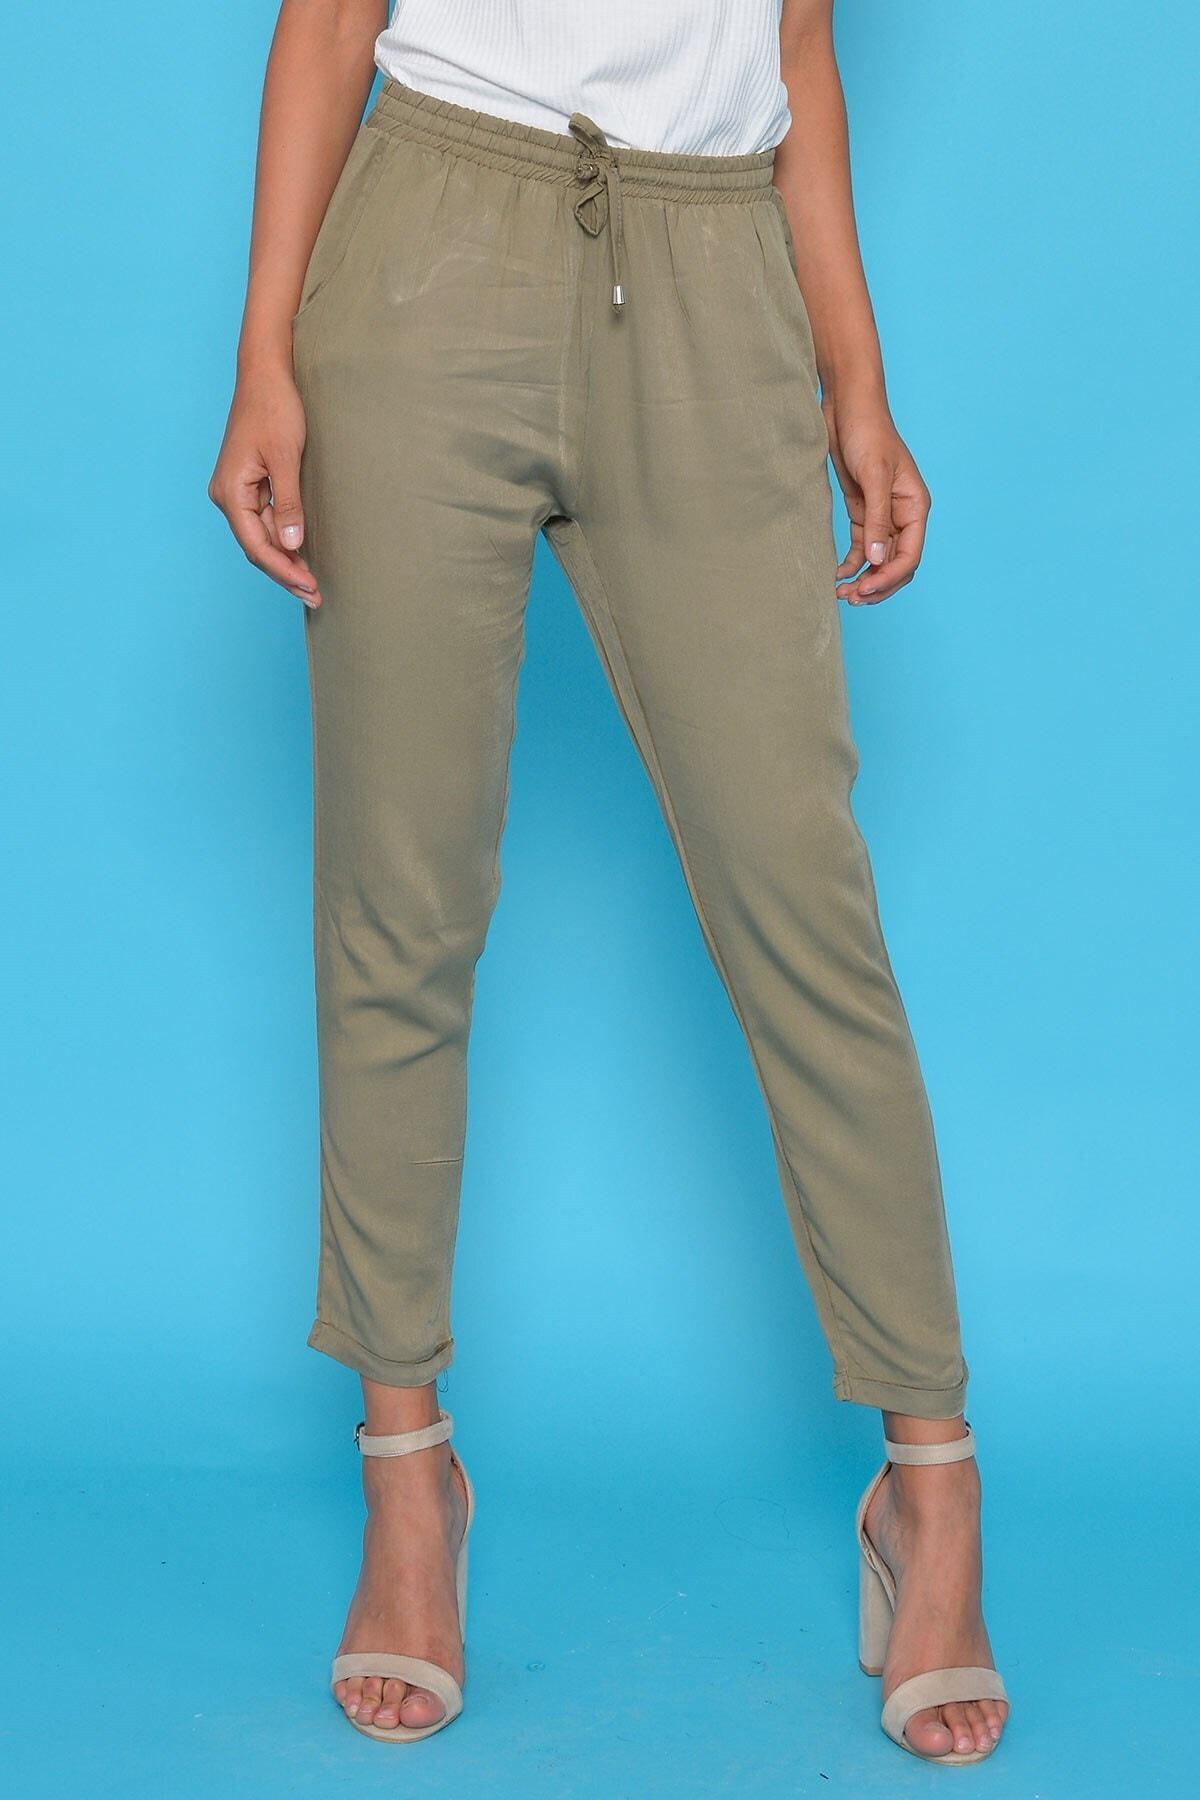 Mossta Kadın Haki Bel Lastikli Pantolon 1